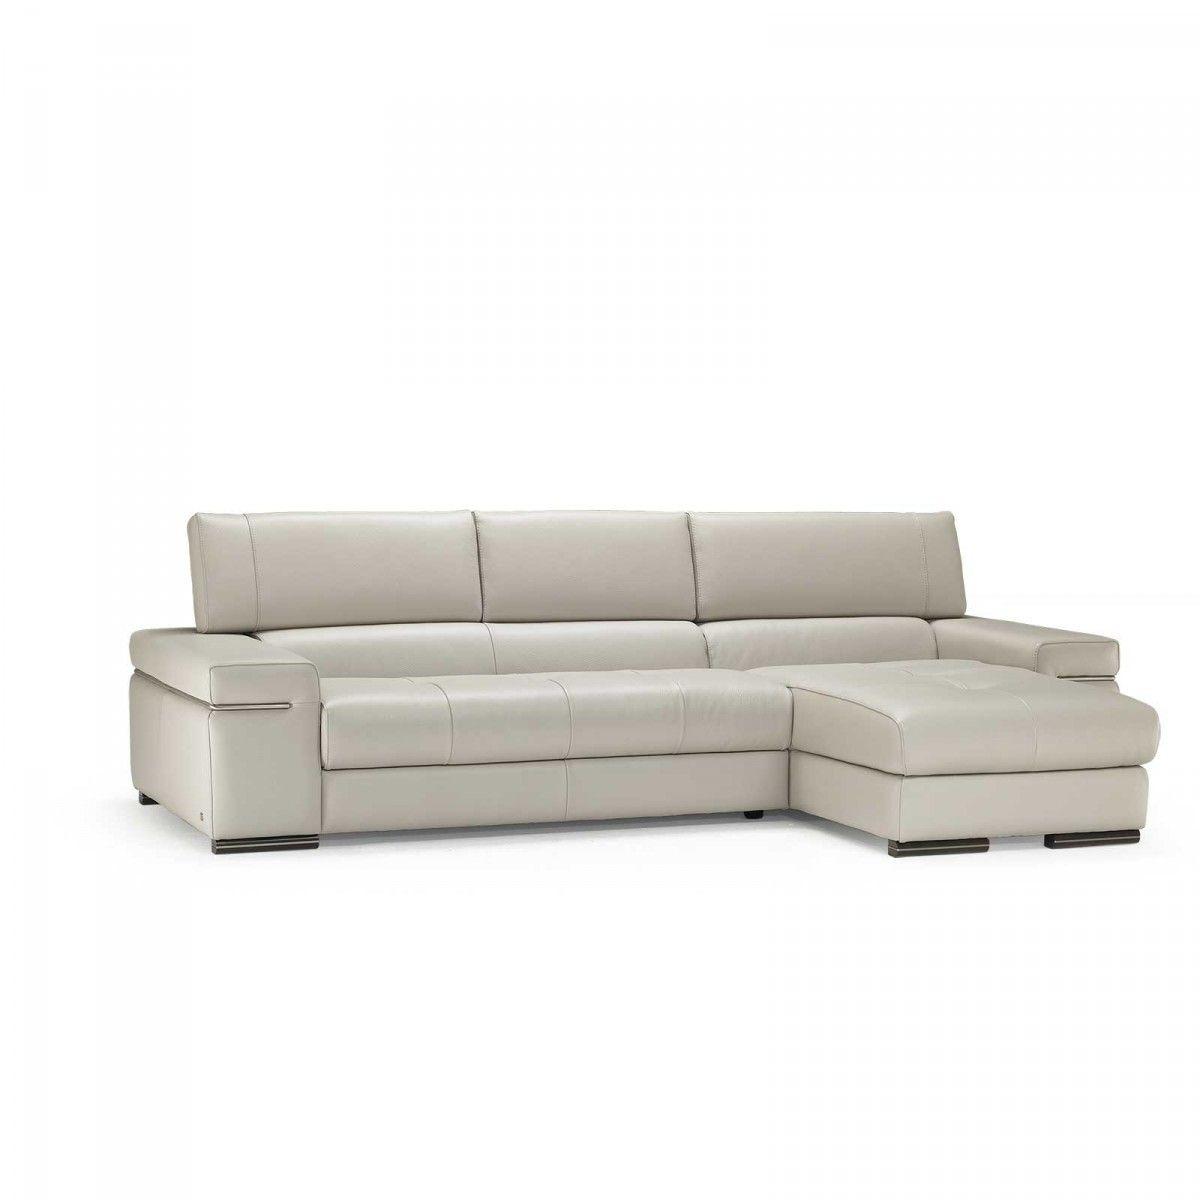 Leather Sectional Sofa Gta: Italian Modern Furniture From